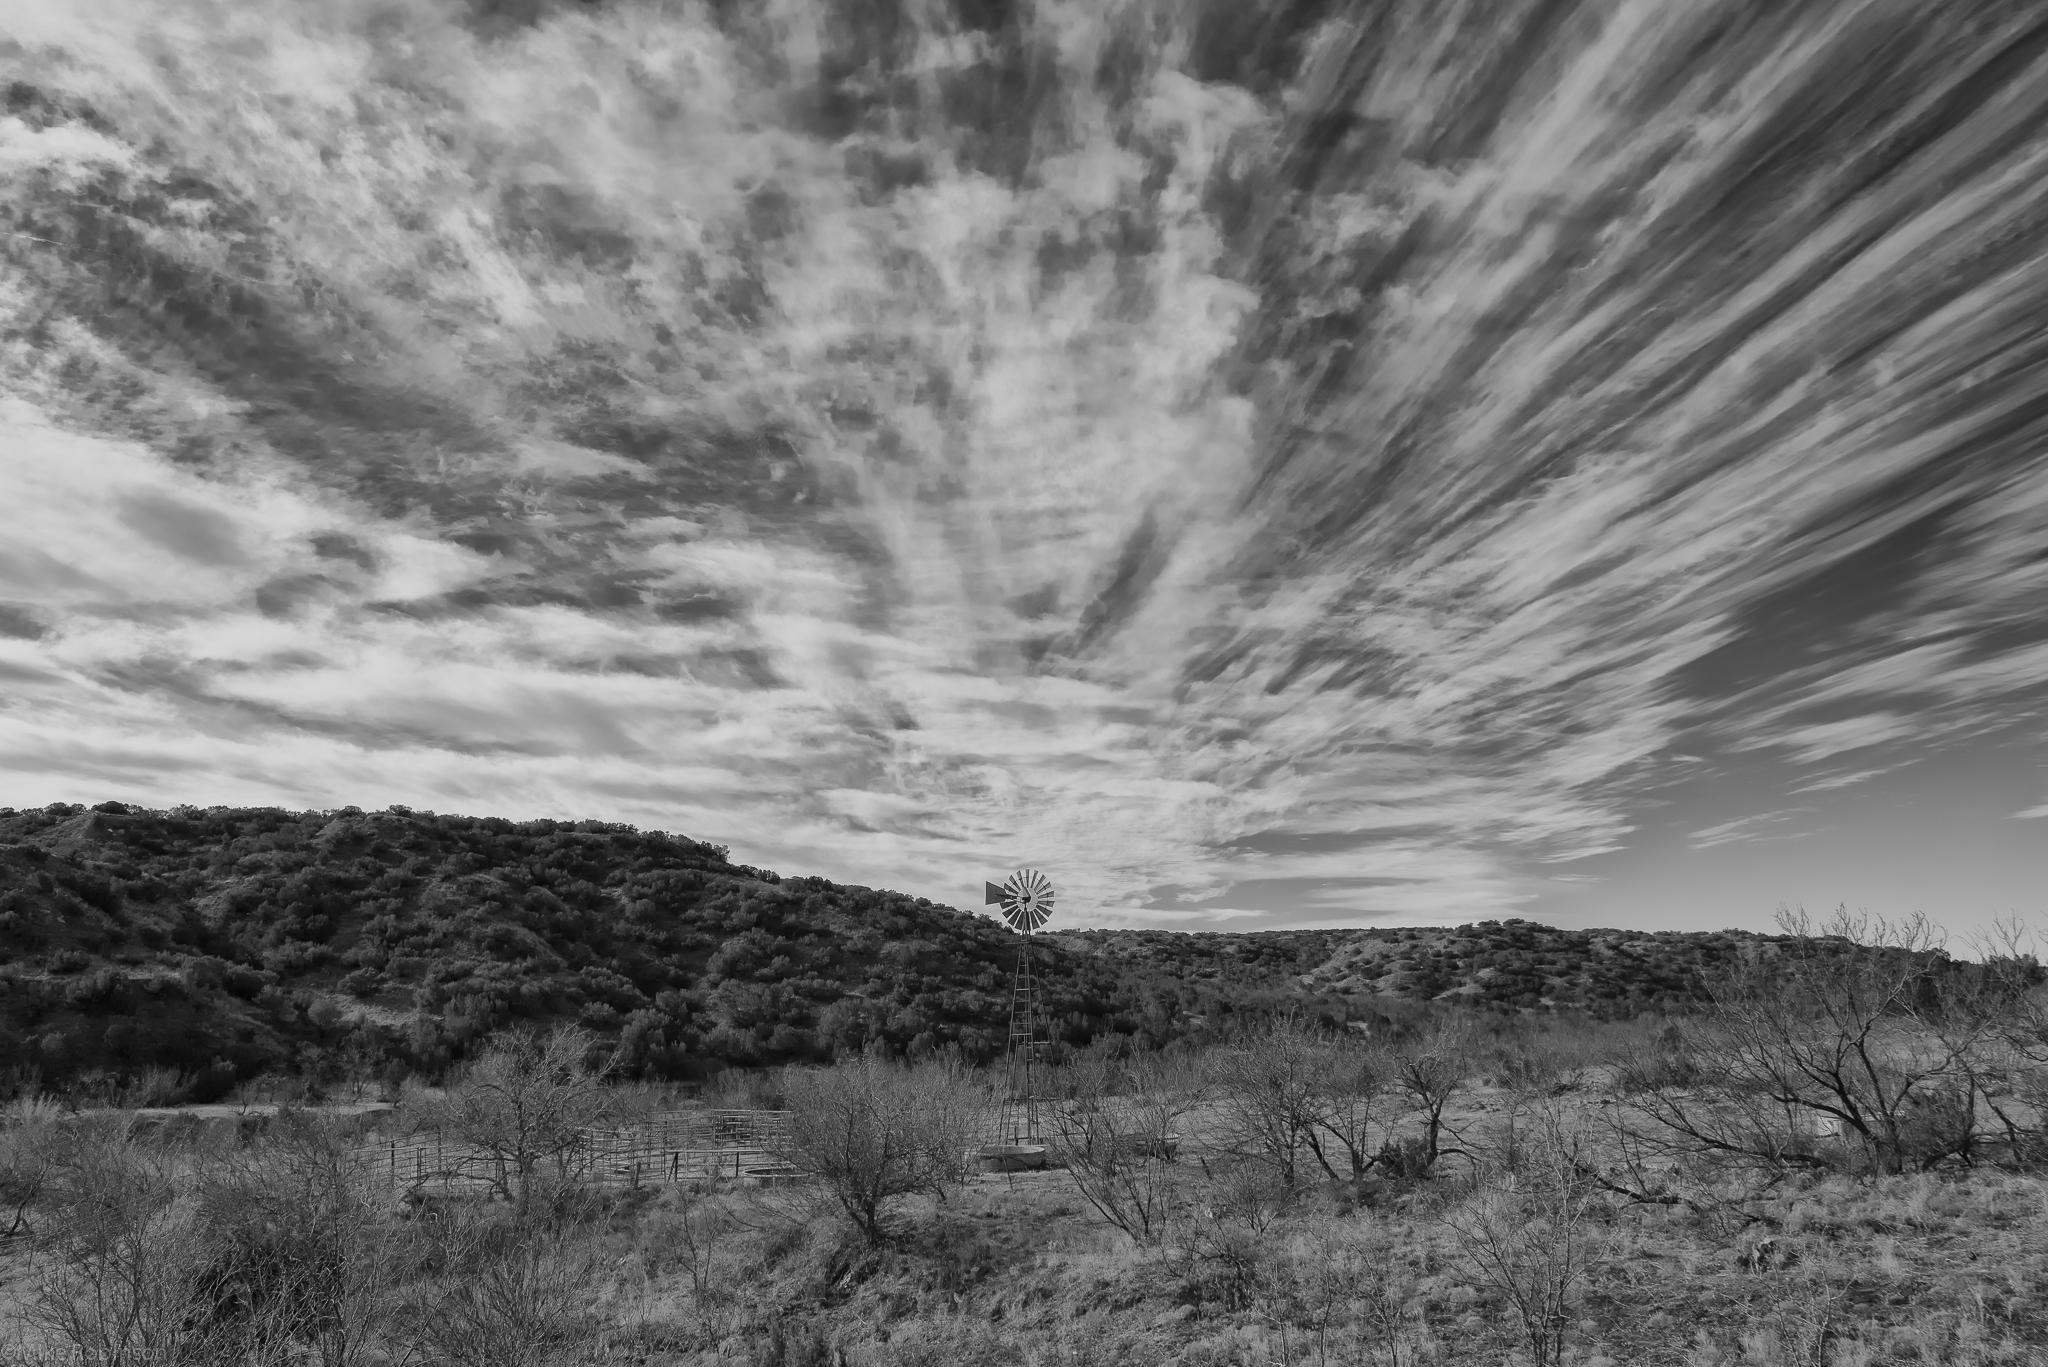 West_TX_Winter_Clouds_Windmill_BW